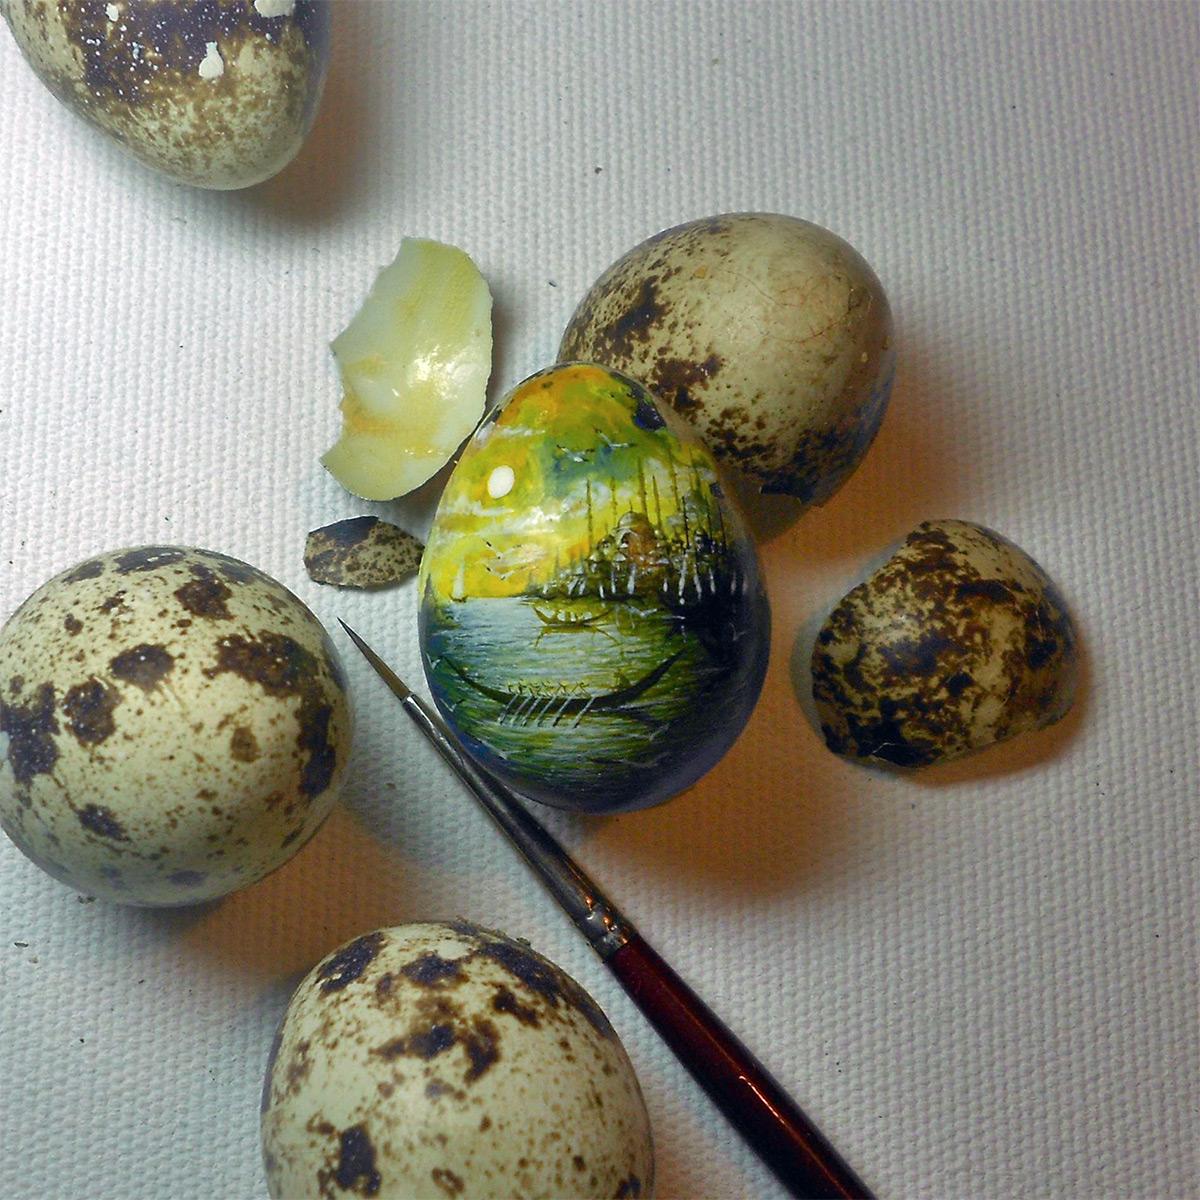 food_art_design_culinaire_peinture_milka_m&ms_chocolat_banane_coffee_istambul_turquie_Hasan_Kale_painting